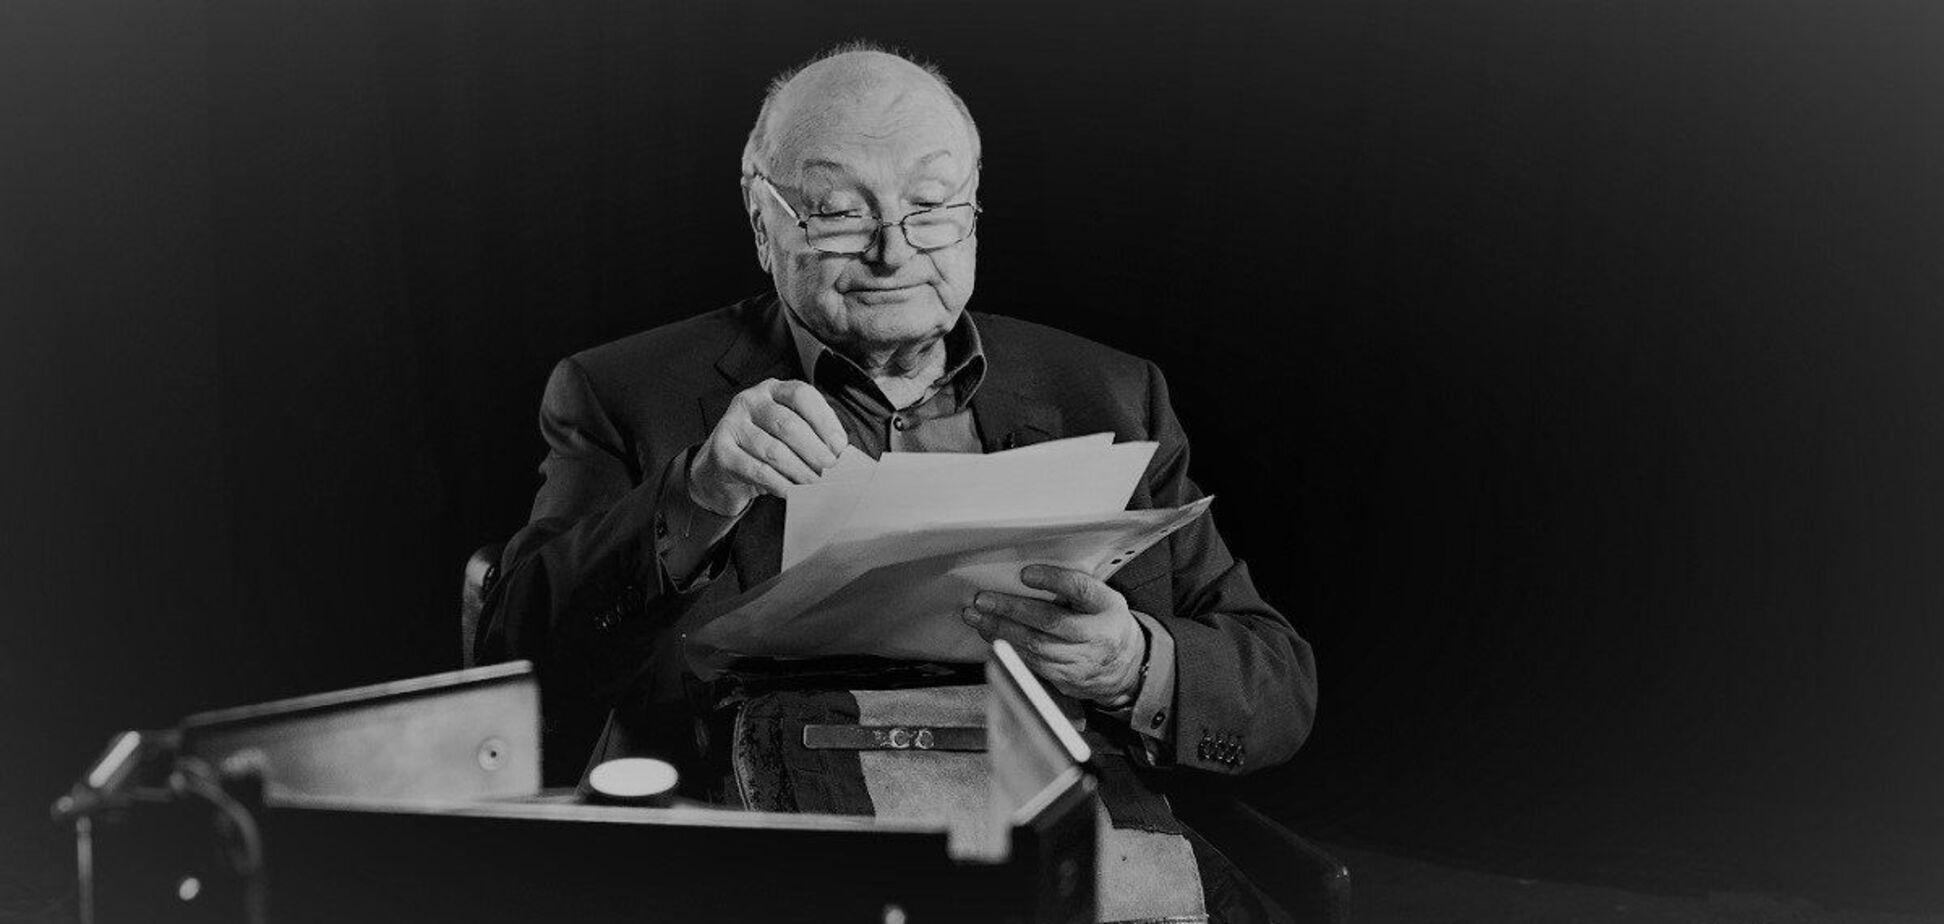 Михайло Жванецький помер 6 листопада